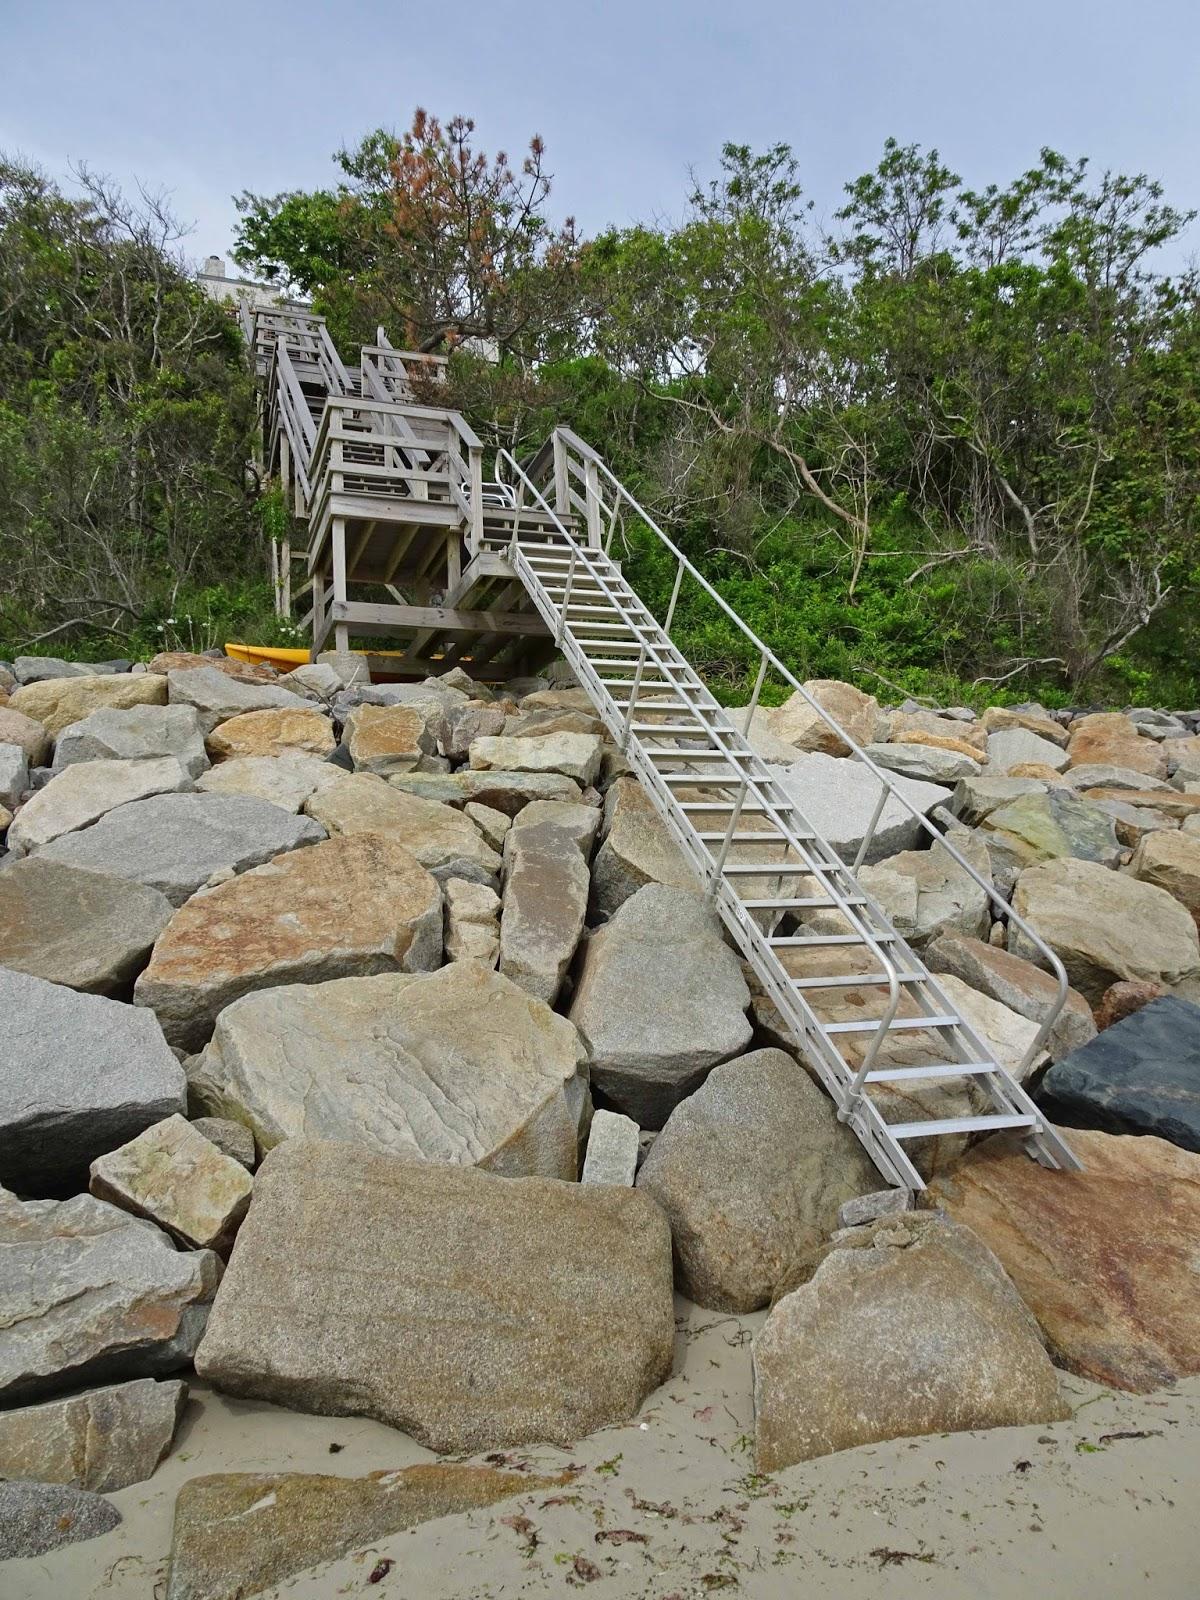 Joe S Retirement Blog Battling Bluff Erosion Manomet